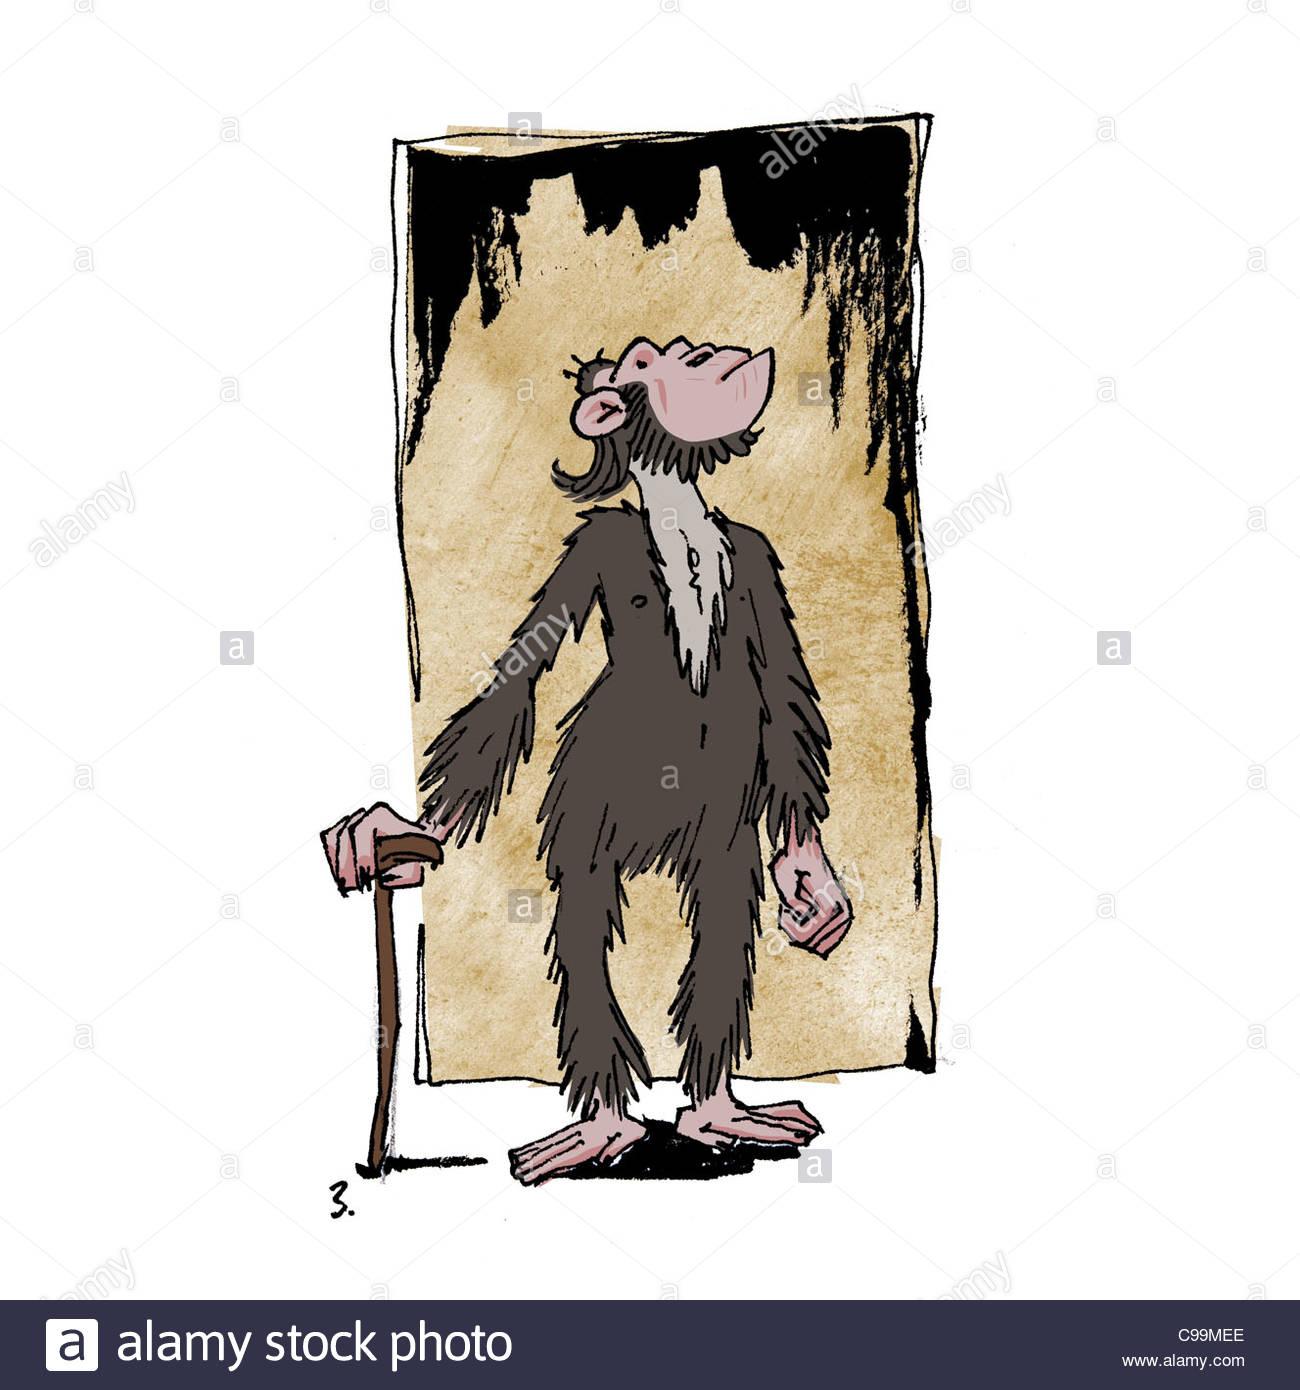 monkey STOCK human Aristocrat - Stock Image